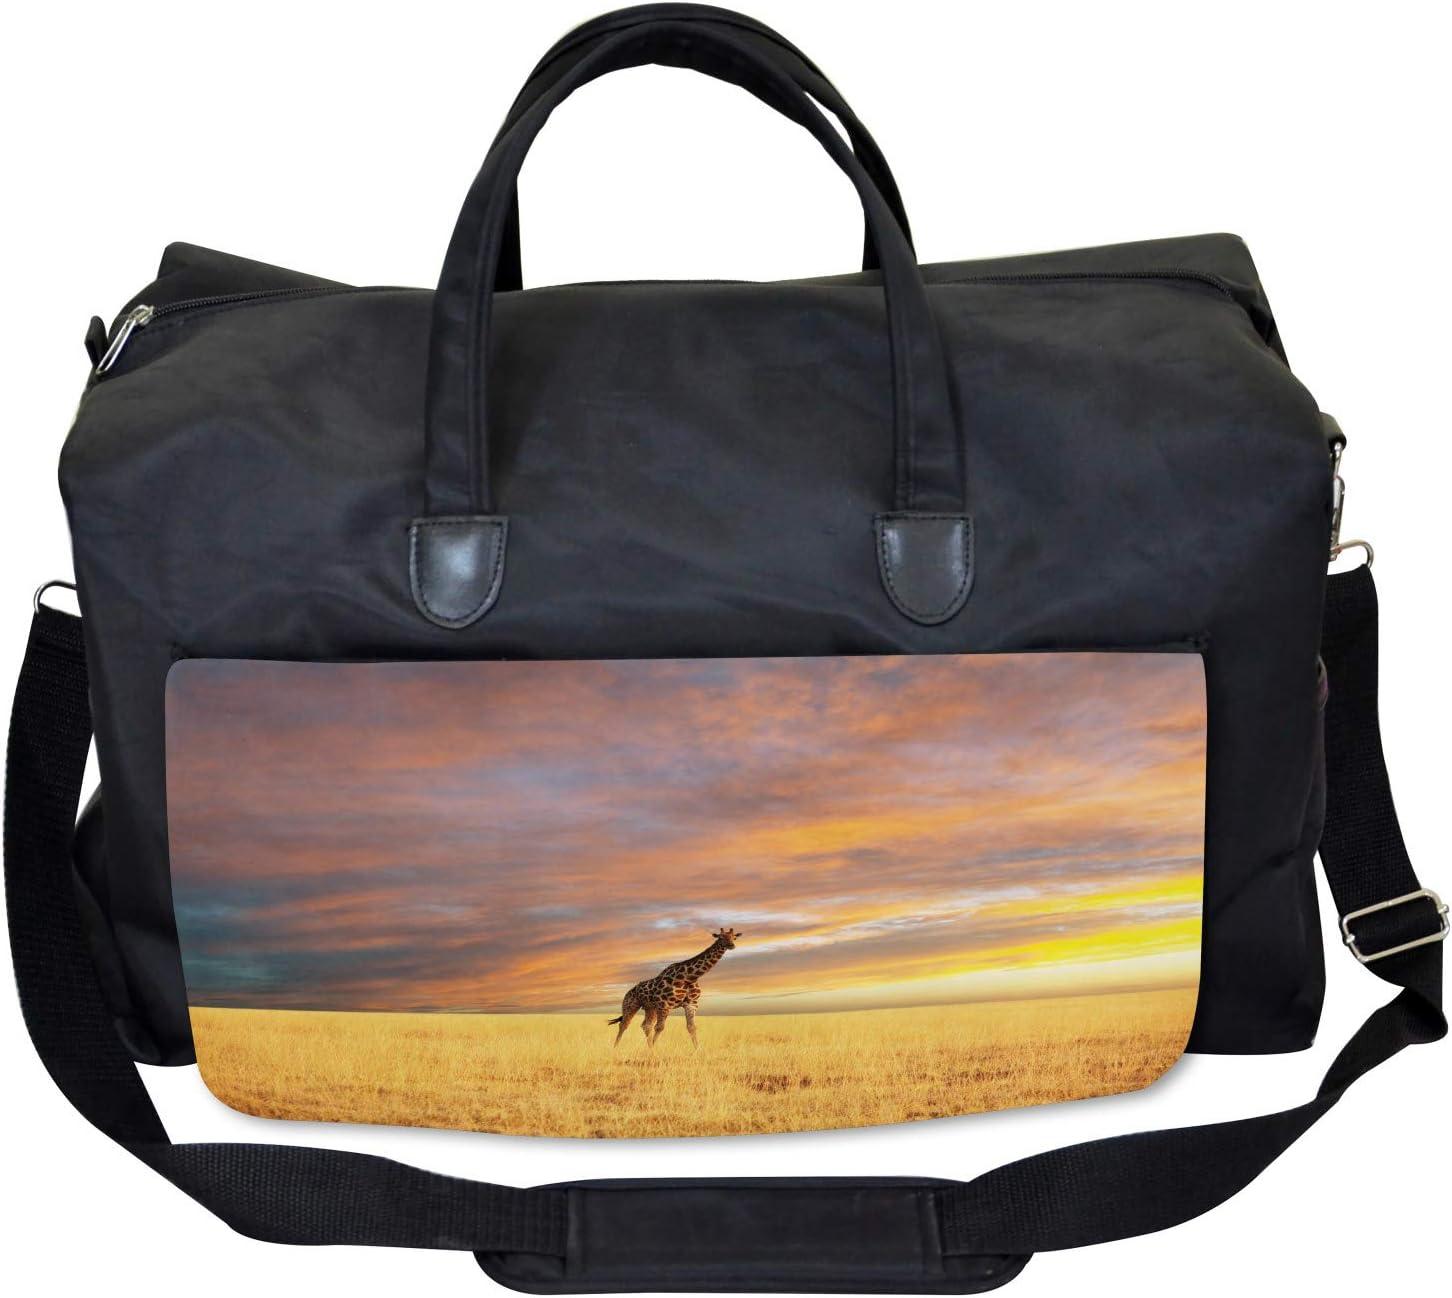 Large Weekender Carry-on African Wildlife Ambesonne Giraffe Gym Bag